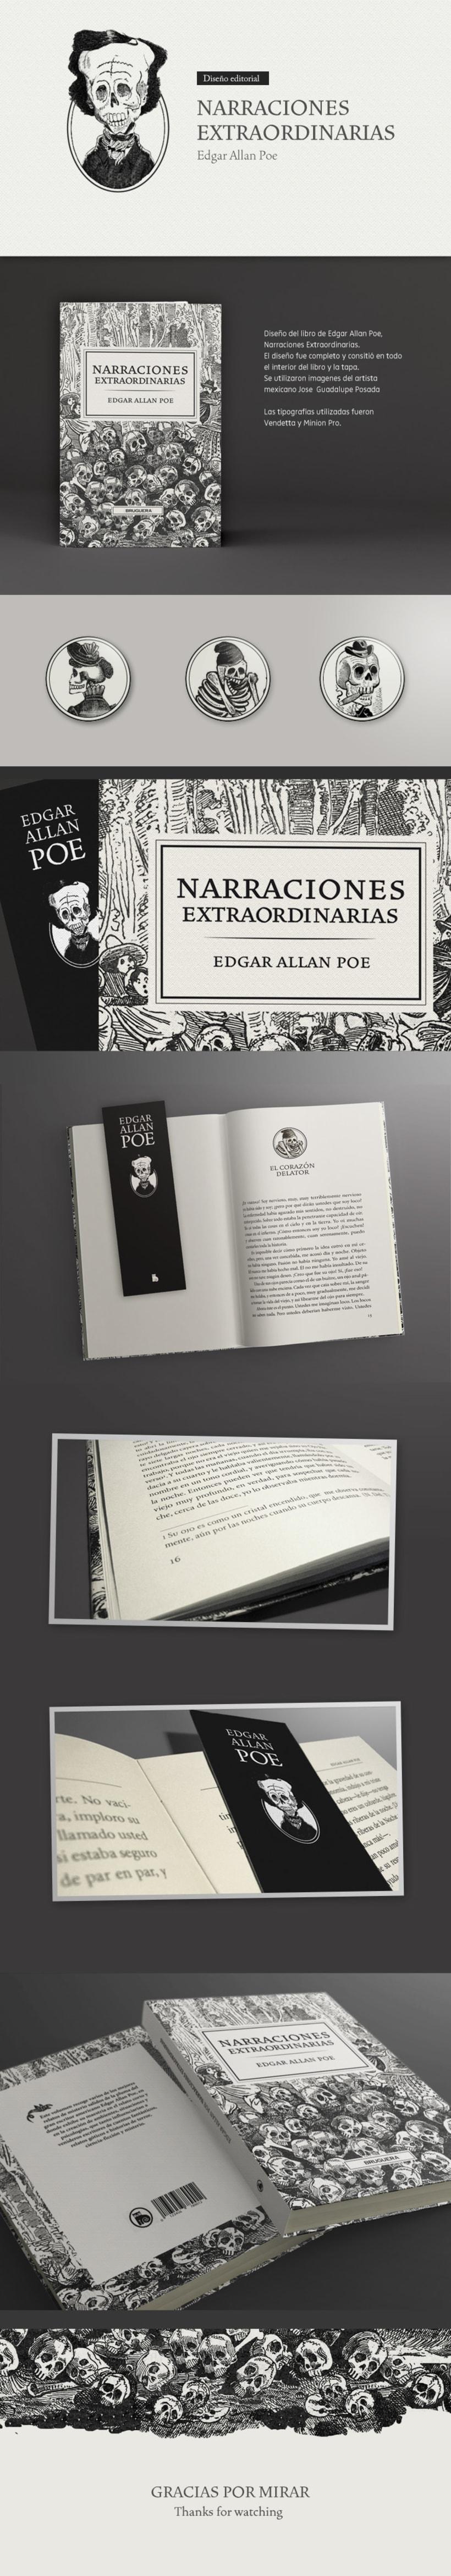 E. A. Poe / Narraciones Extraordinarias -1